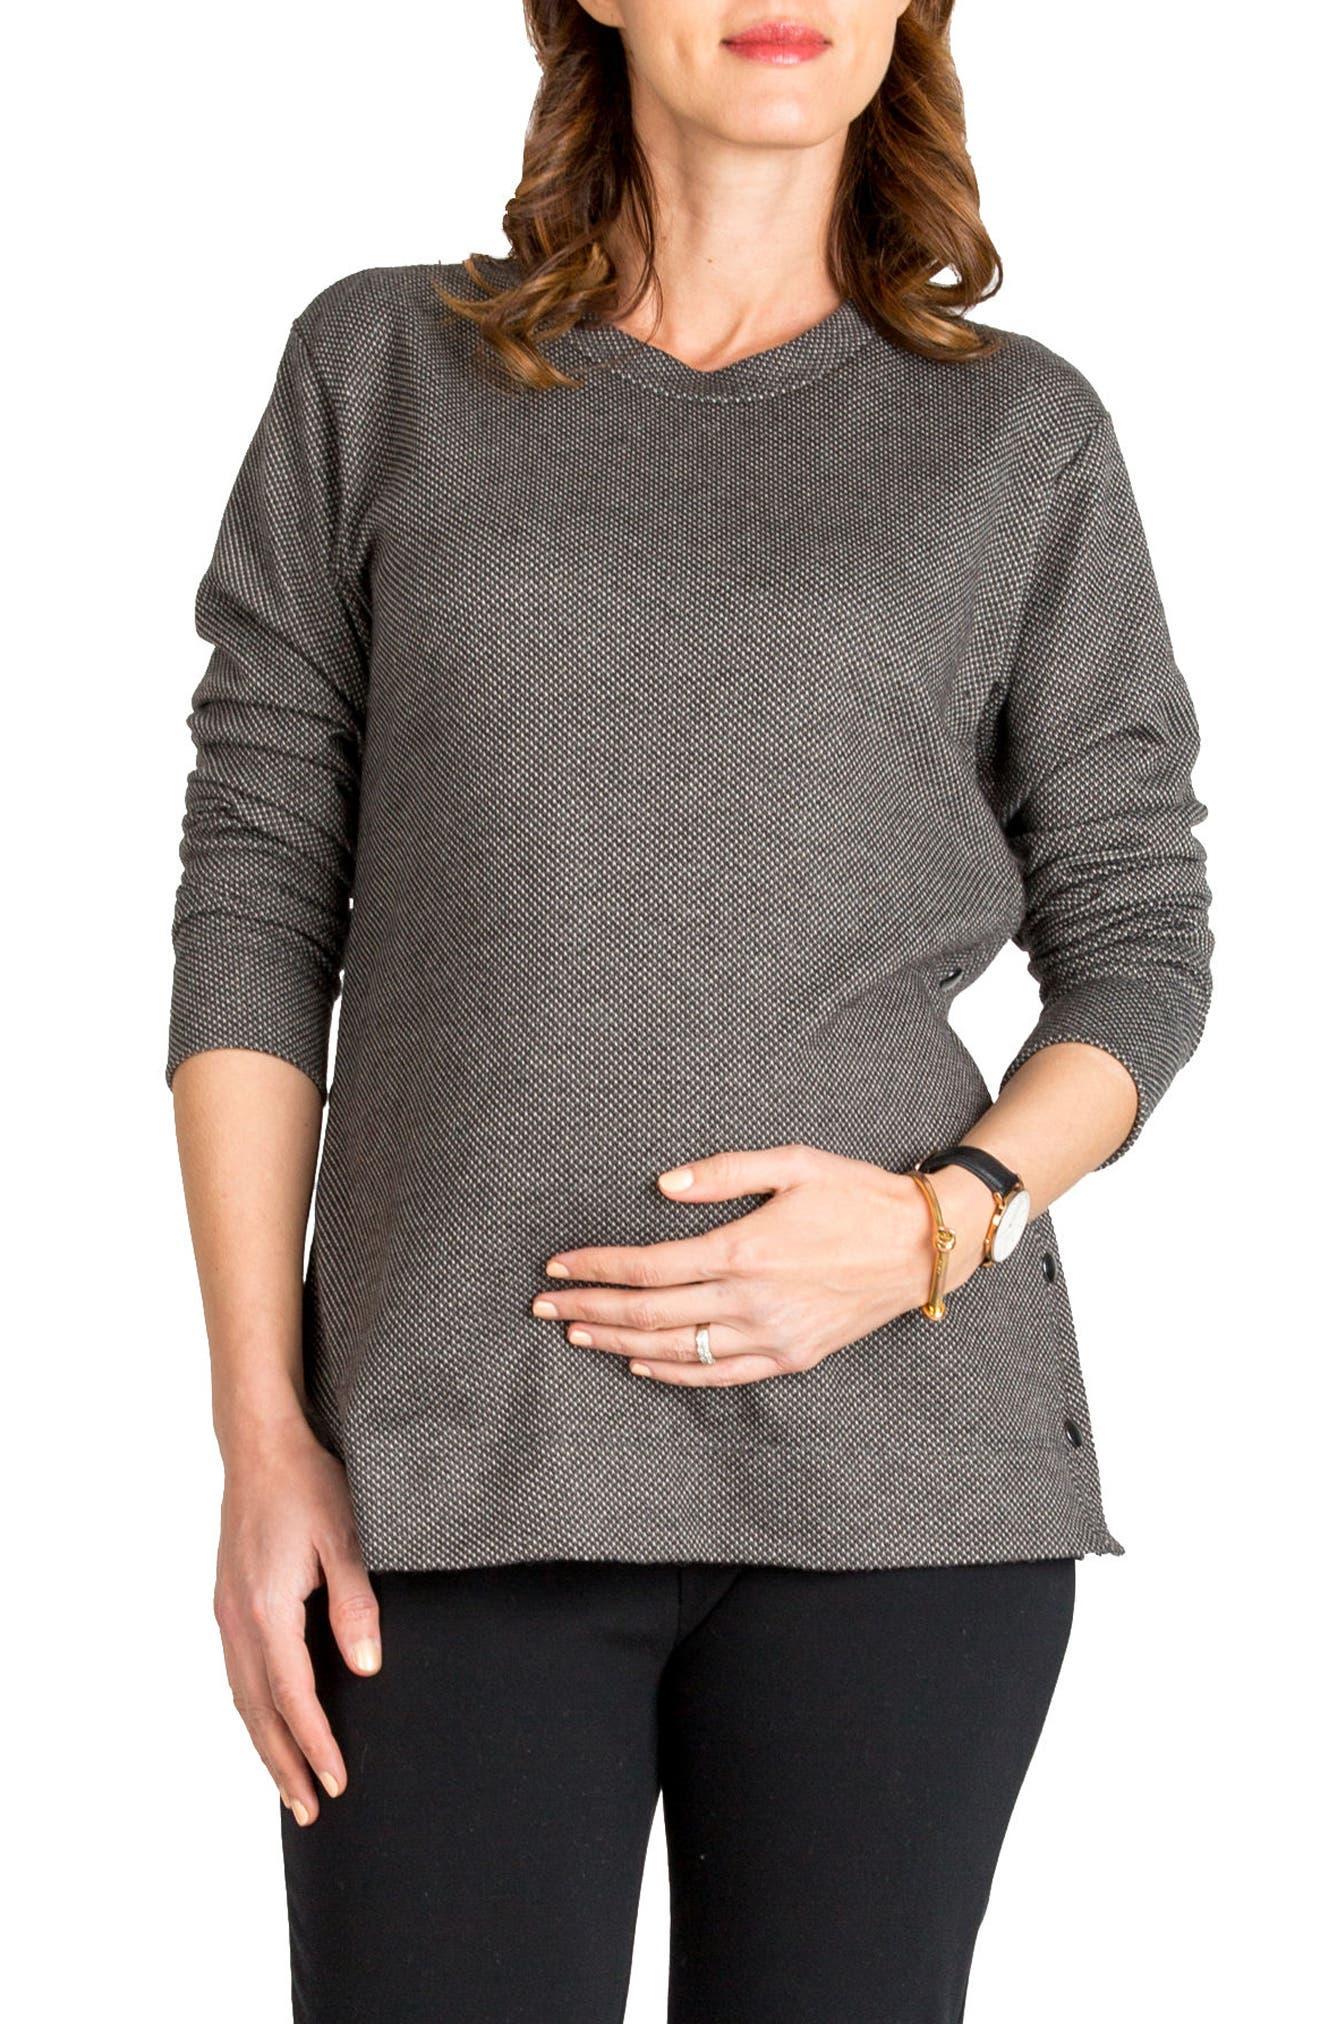 NOM MATERNITY,                             Olivia Snap Side Maternity Sweater,                             Main thumbnail 1, color,                             020